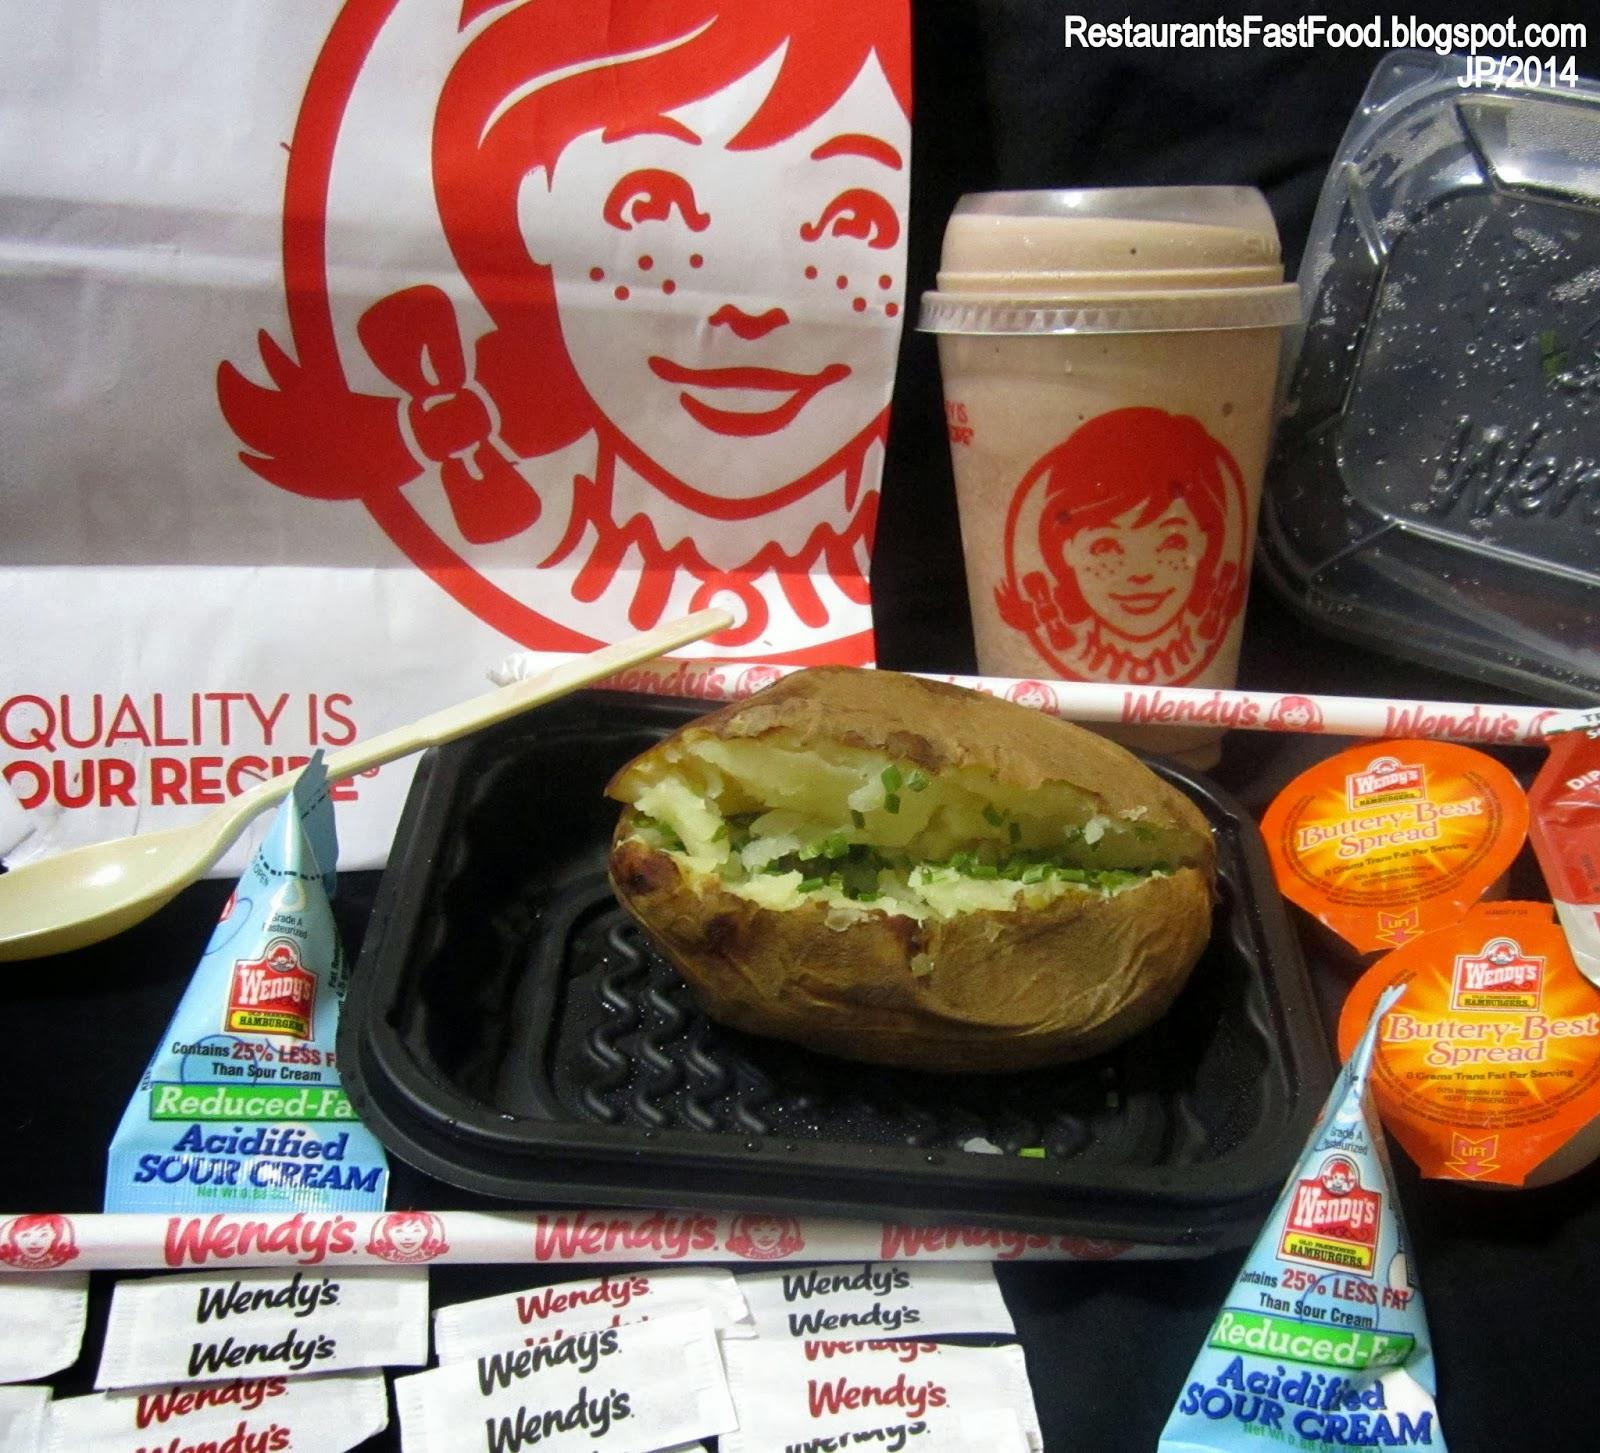 Fast Food Chili Cheeseburger